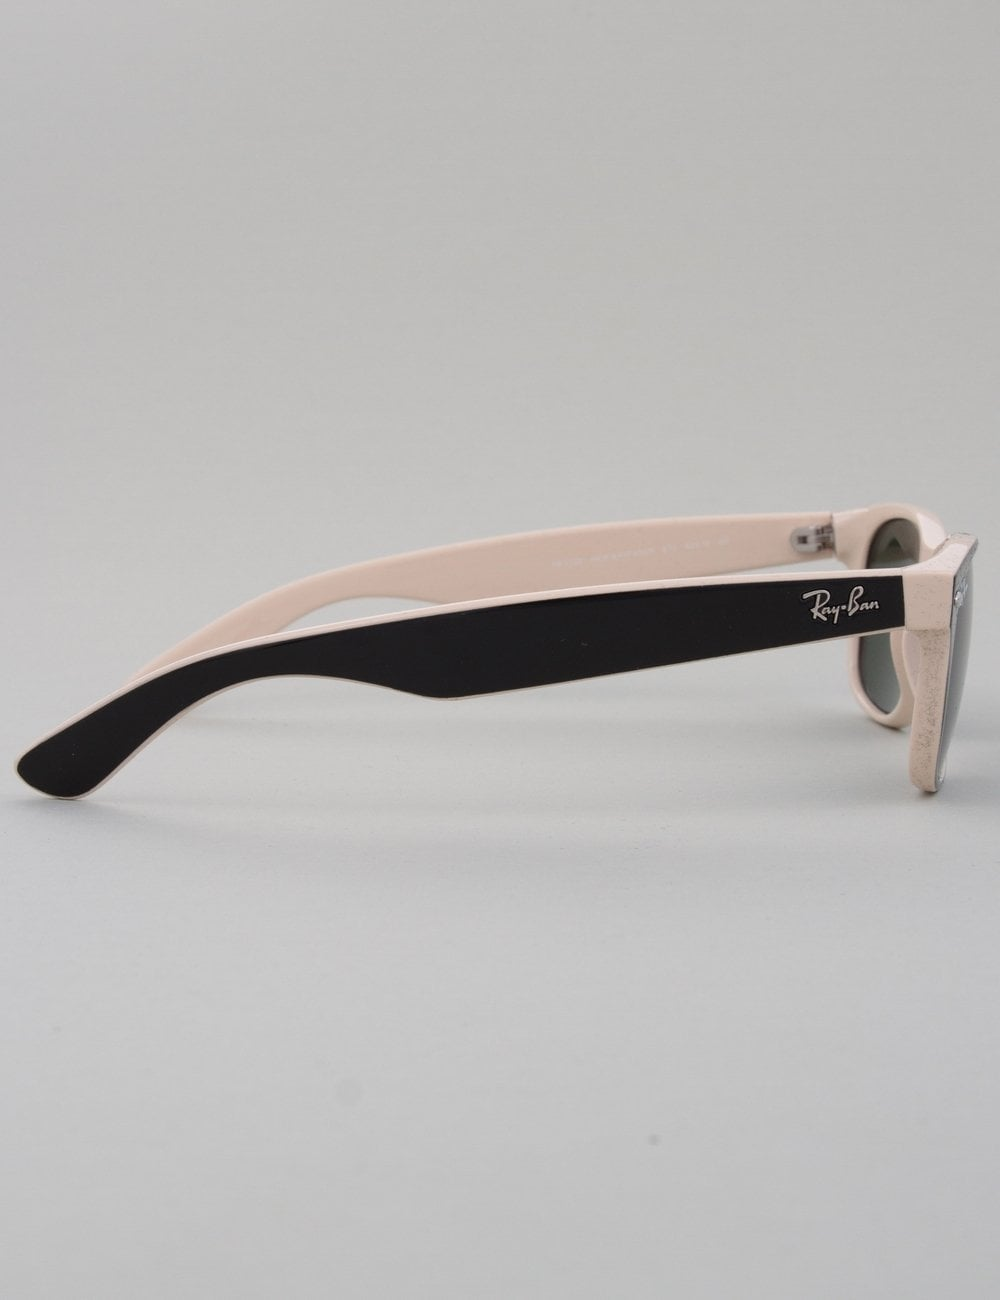 73282164e3018 Ray-Ban New Wayfarer Sunglasses - Top Black on Beige    Crystal ...